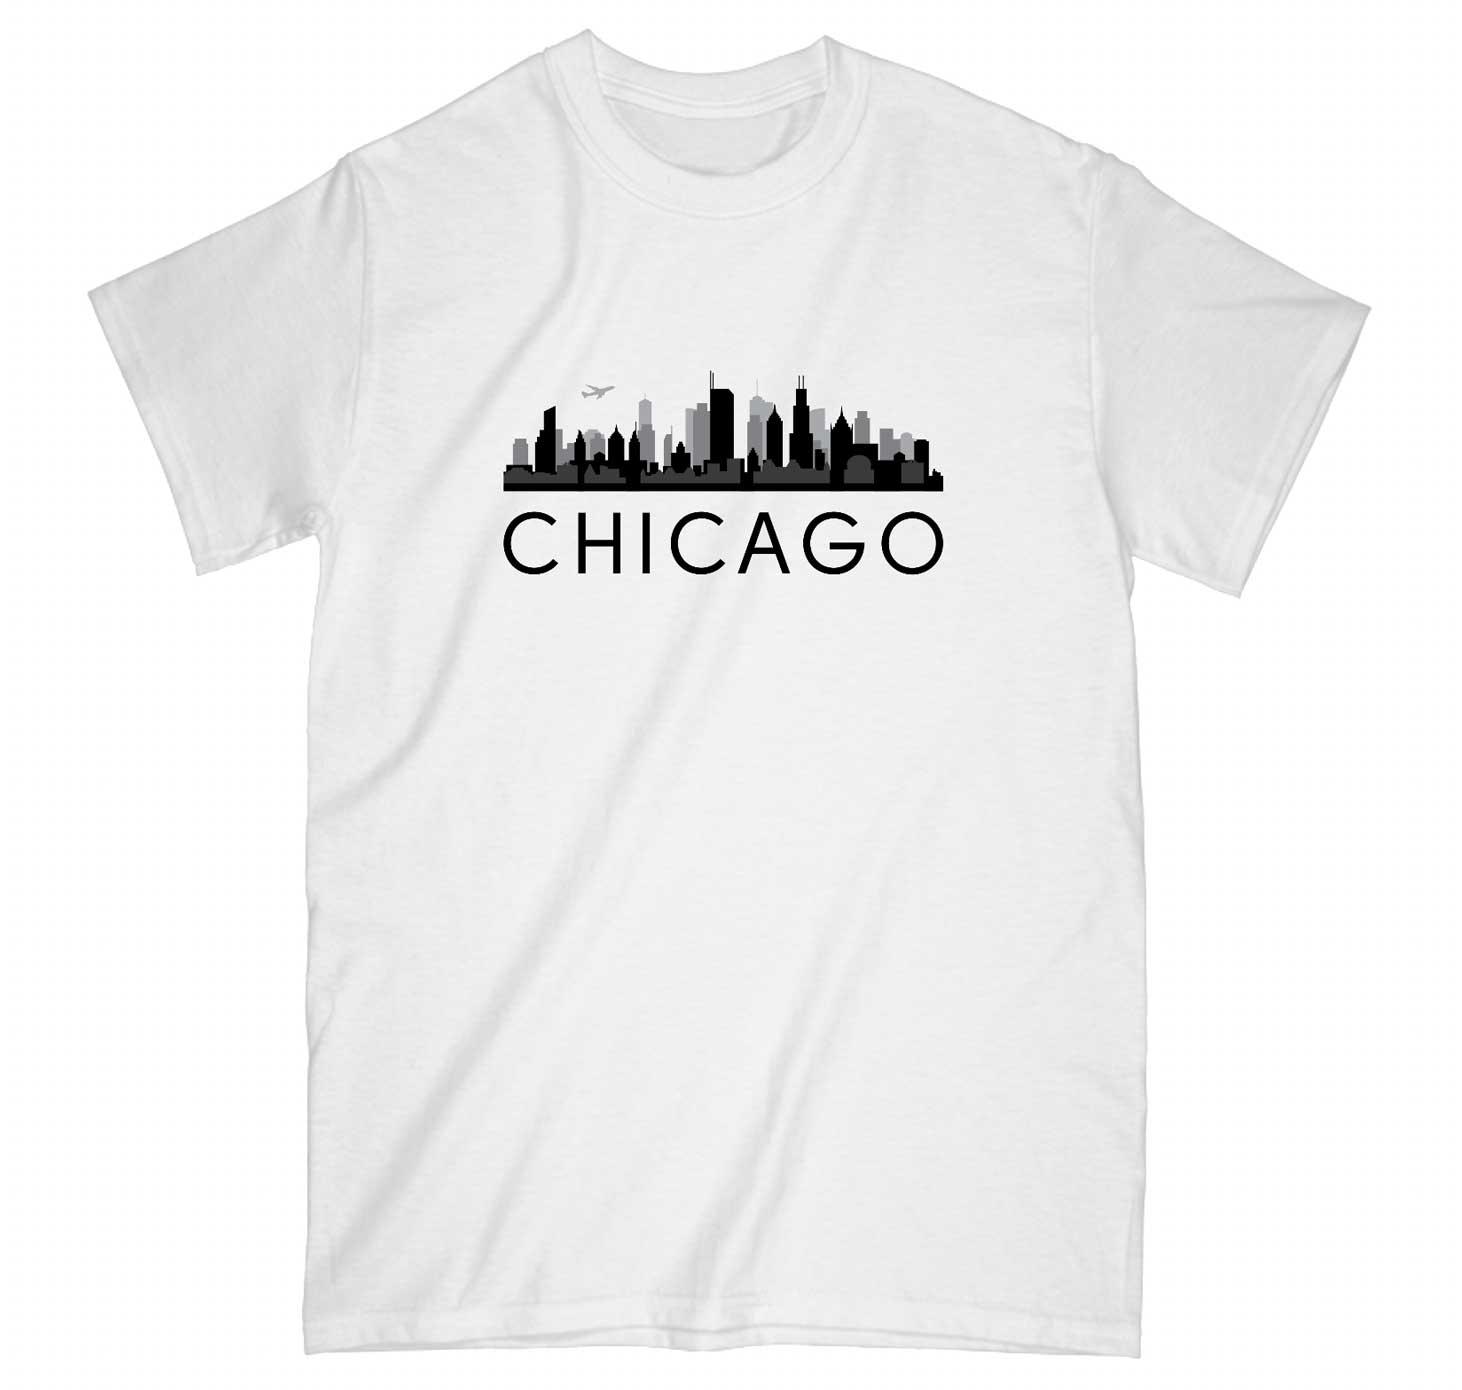 pre-designed t-shirts